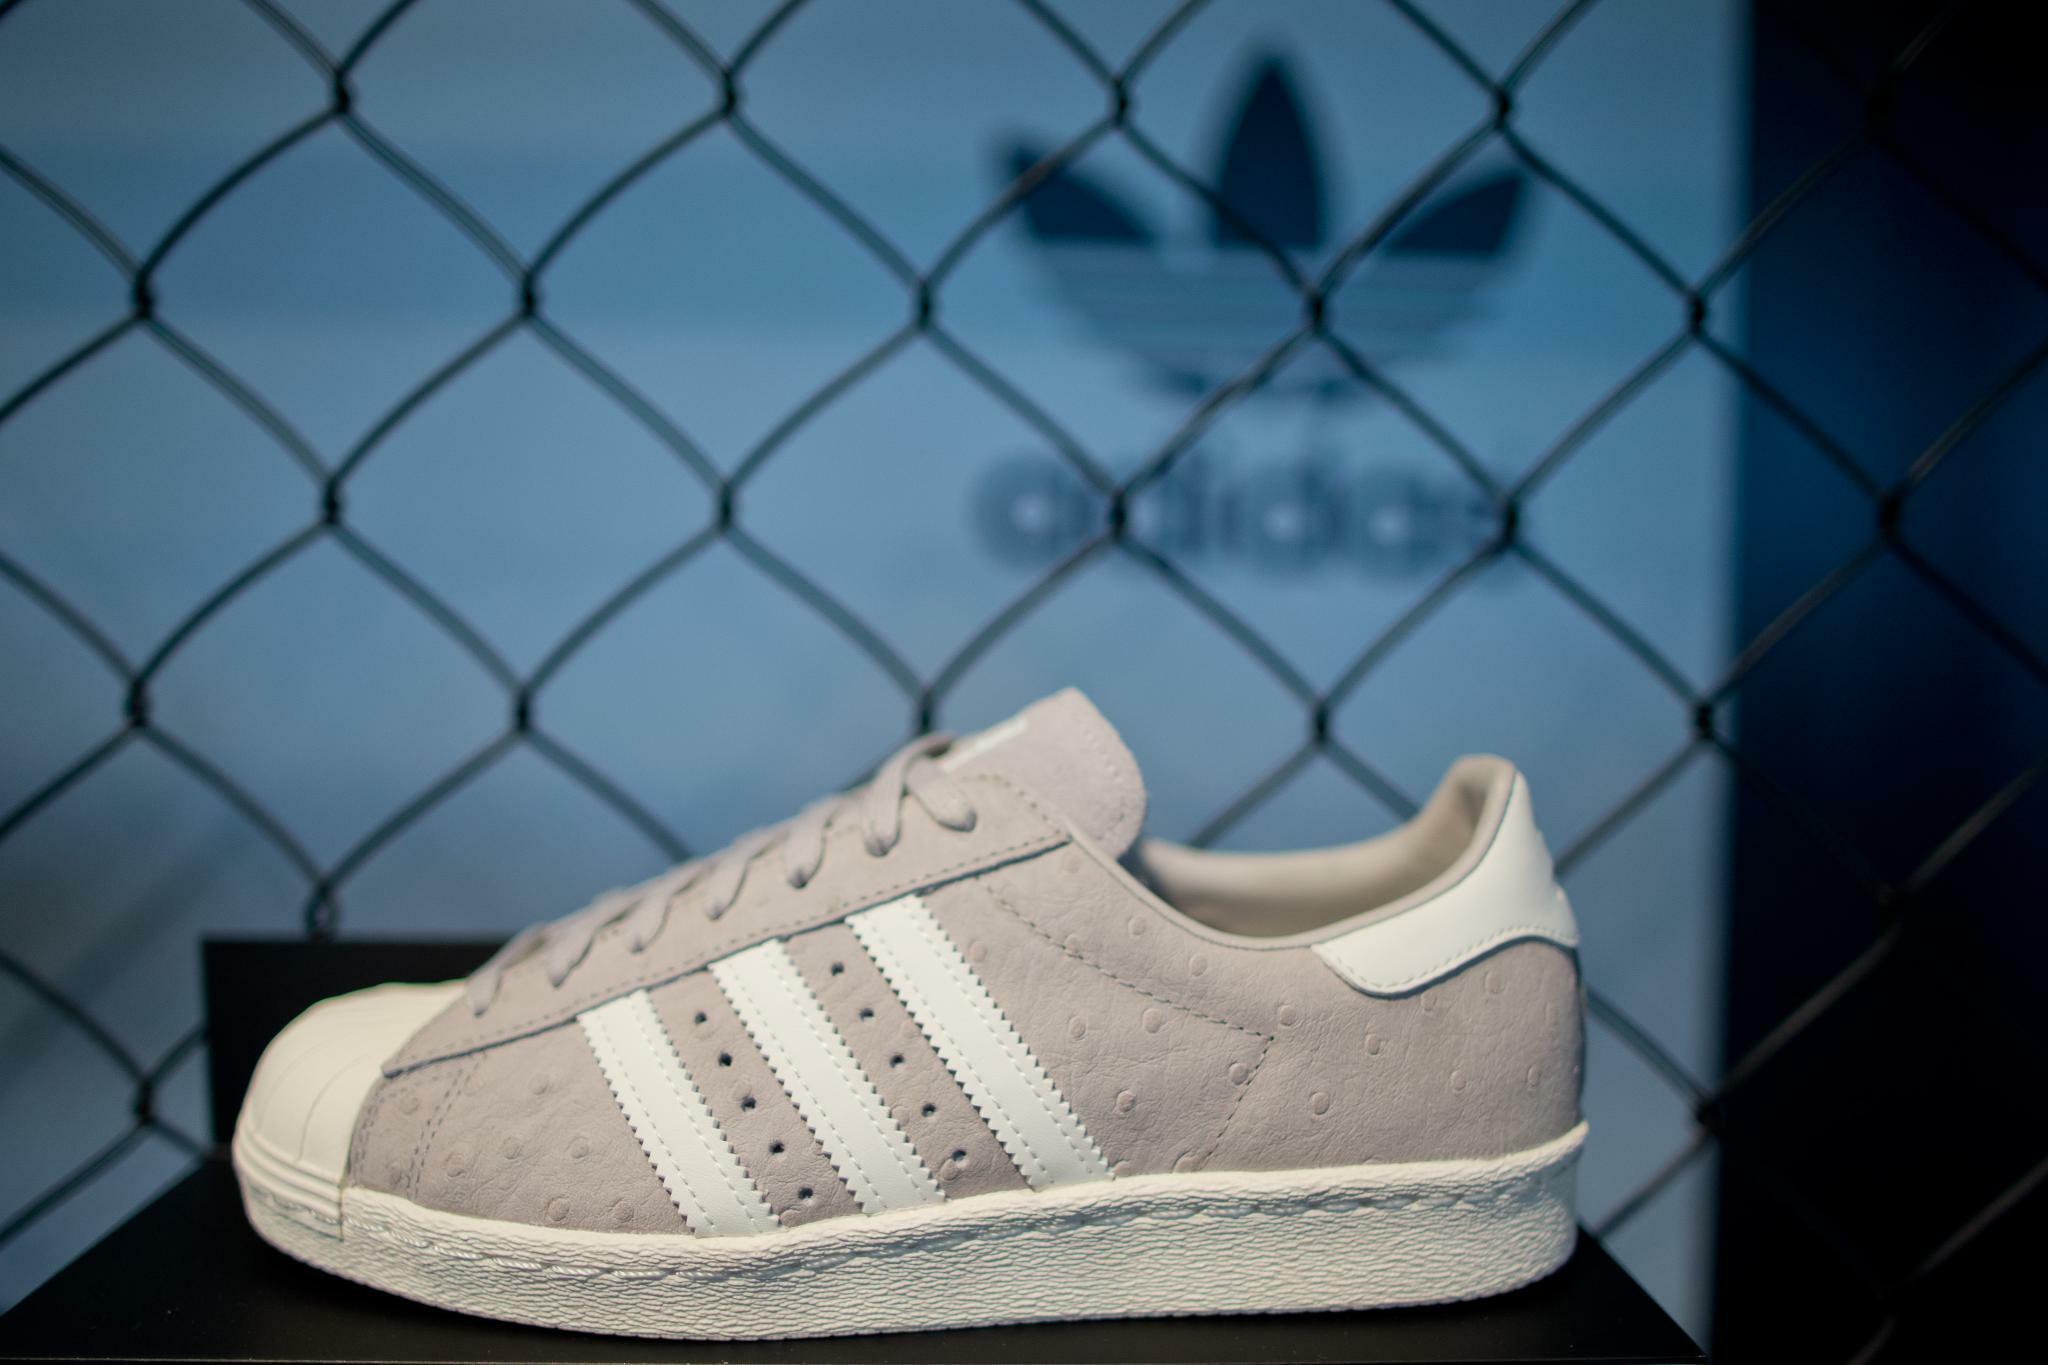 Rechtsstreit um die drei Streifen: Adidas verliert Rechte an